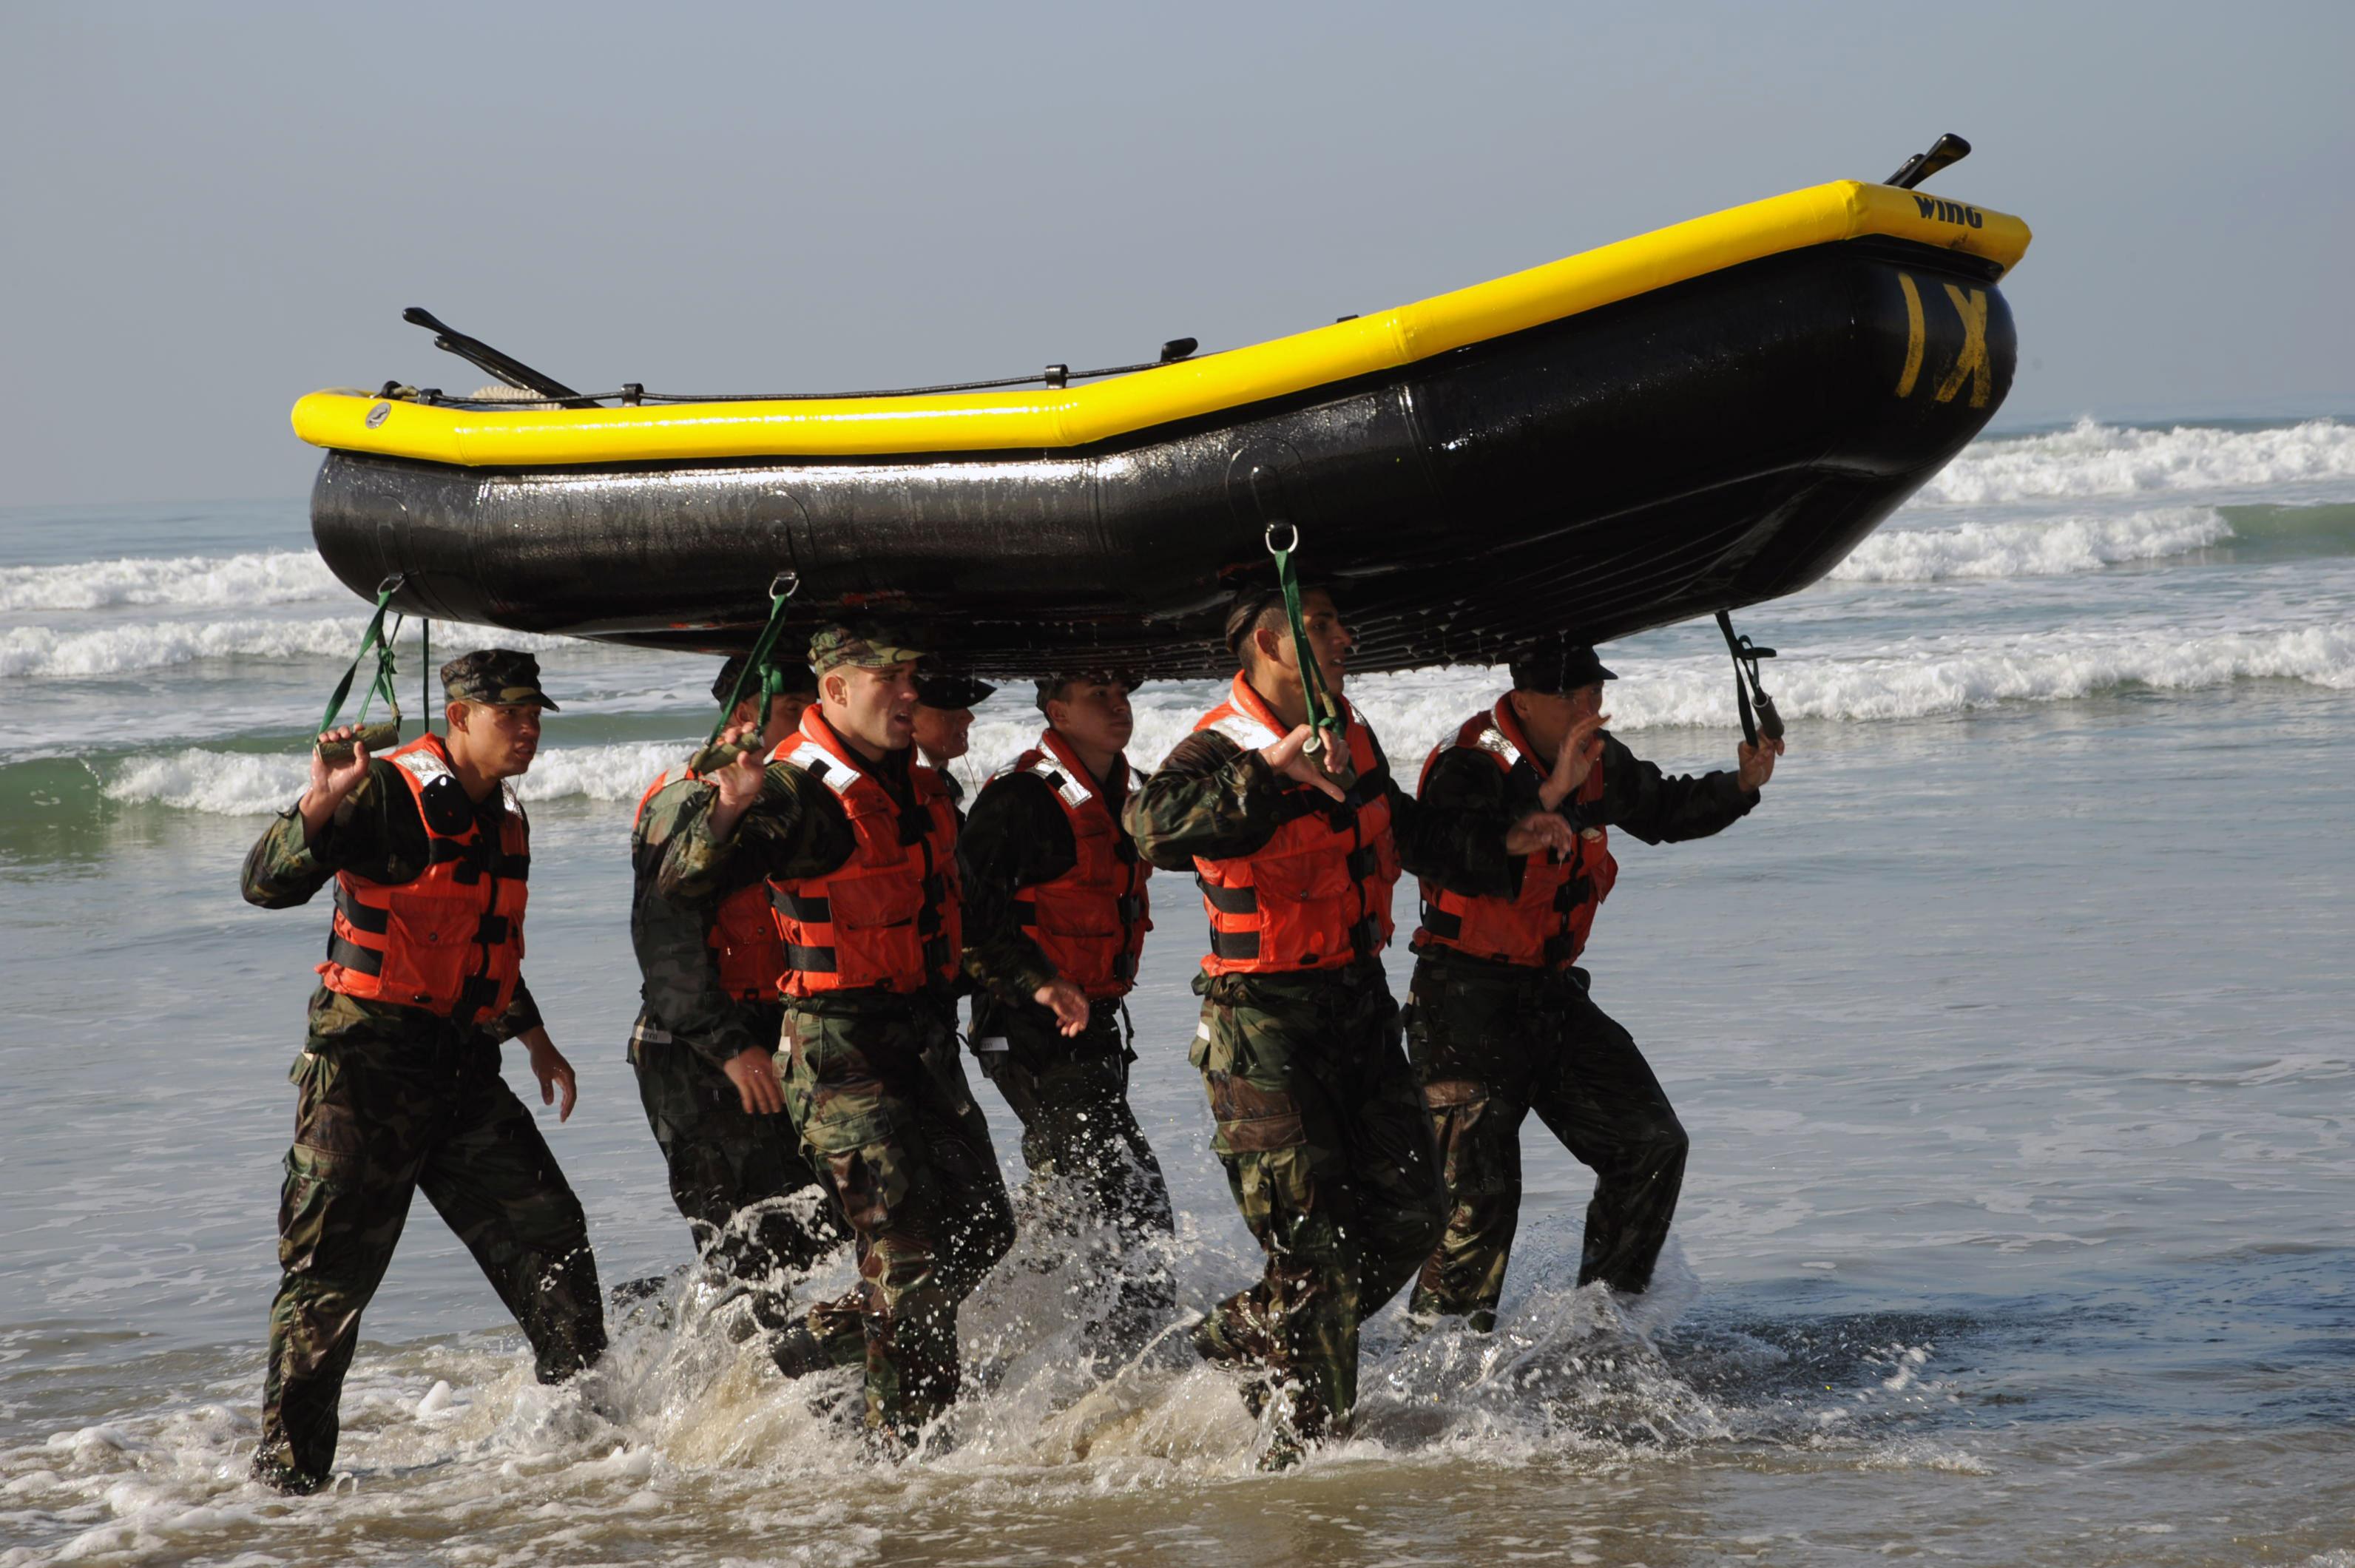 Team Building Training Resources